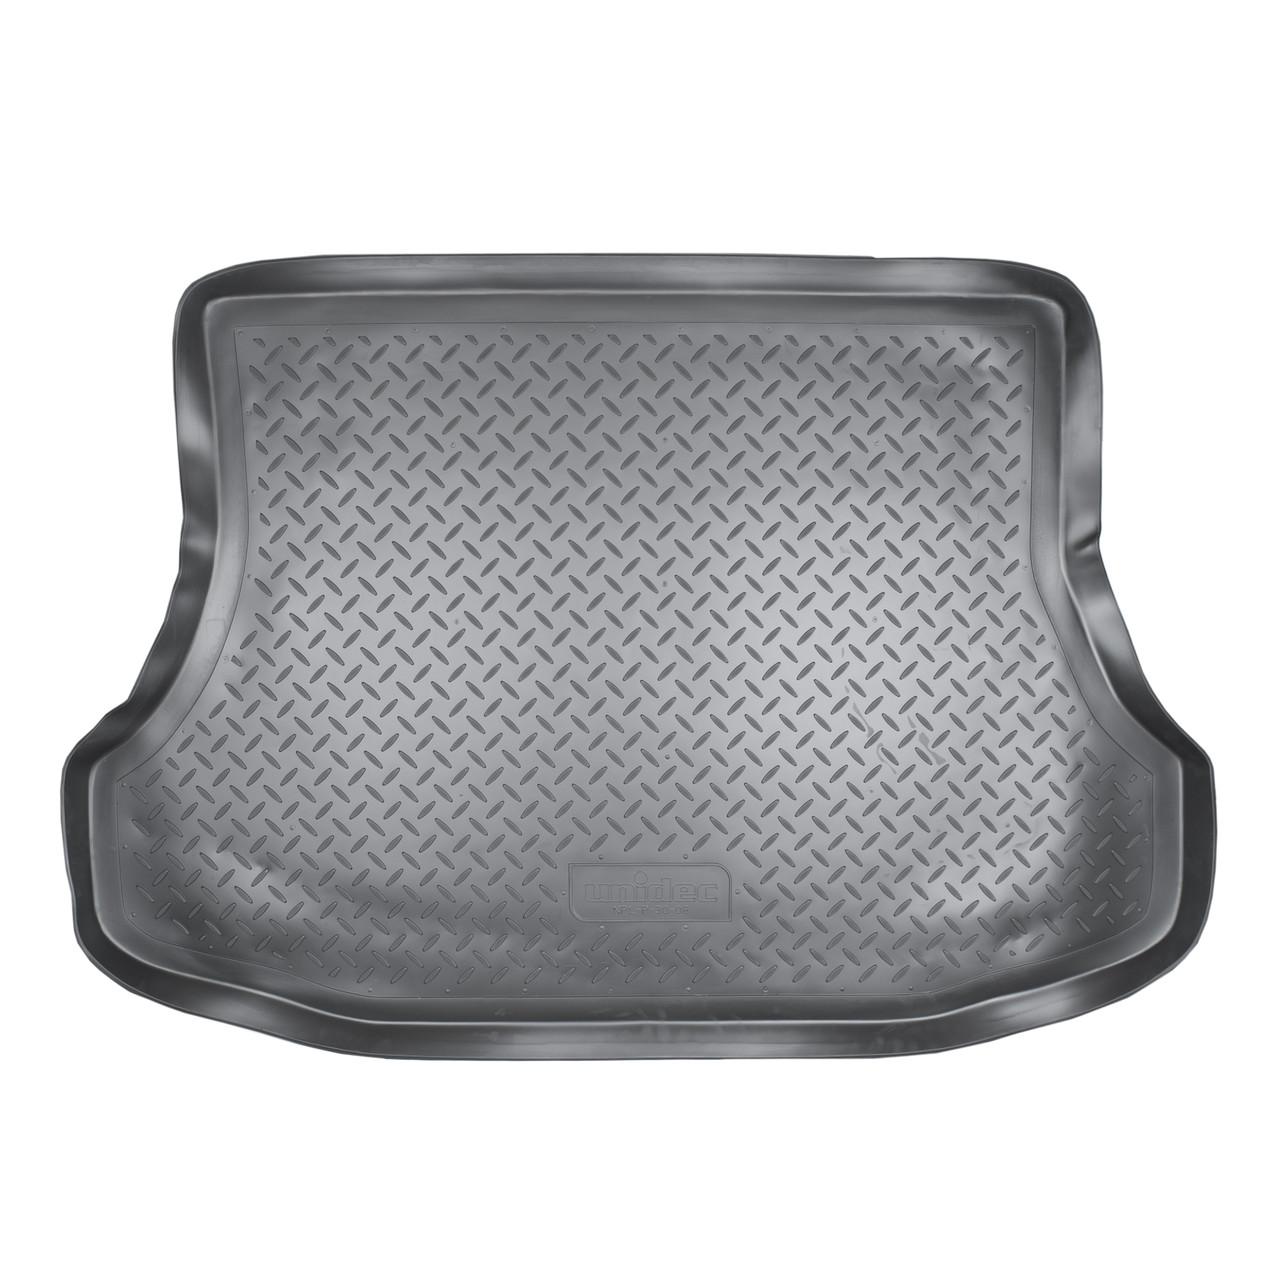 Коврик в багажник Honda Civic VIII (EU)FD1) SD (2006-2012) (4 двери)